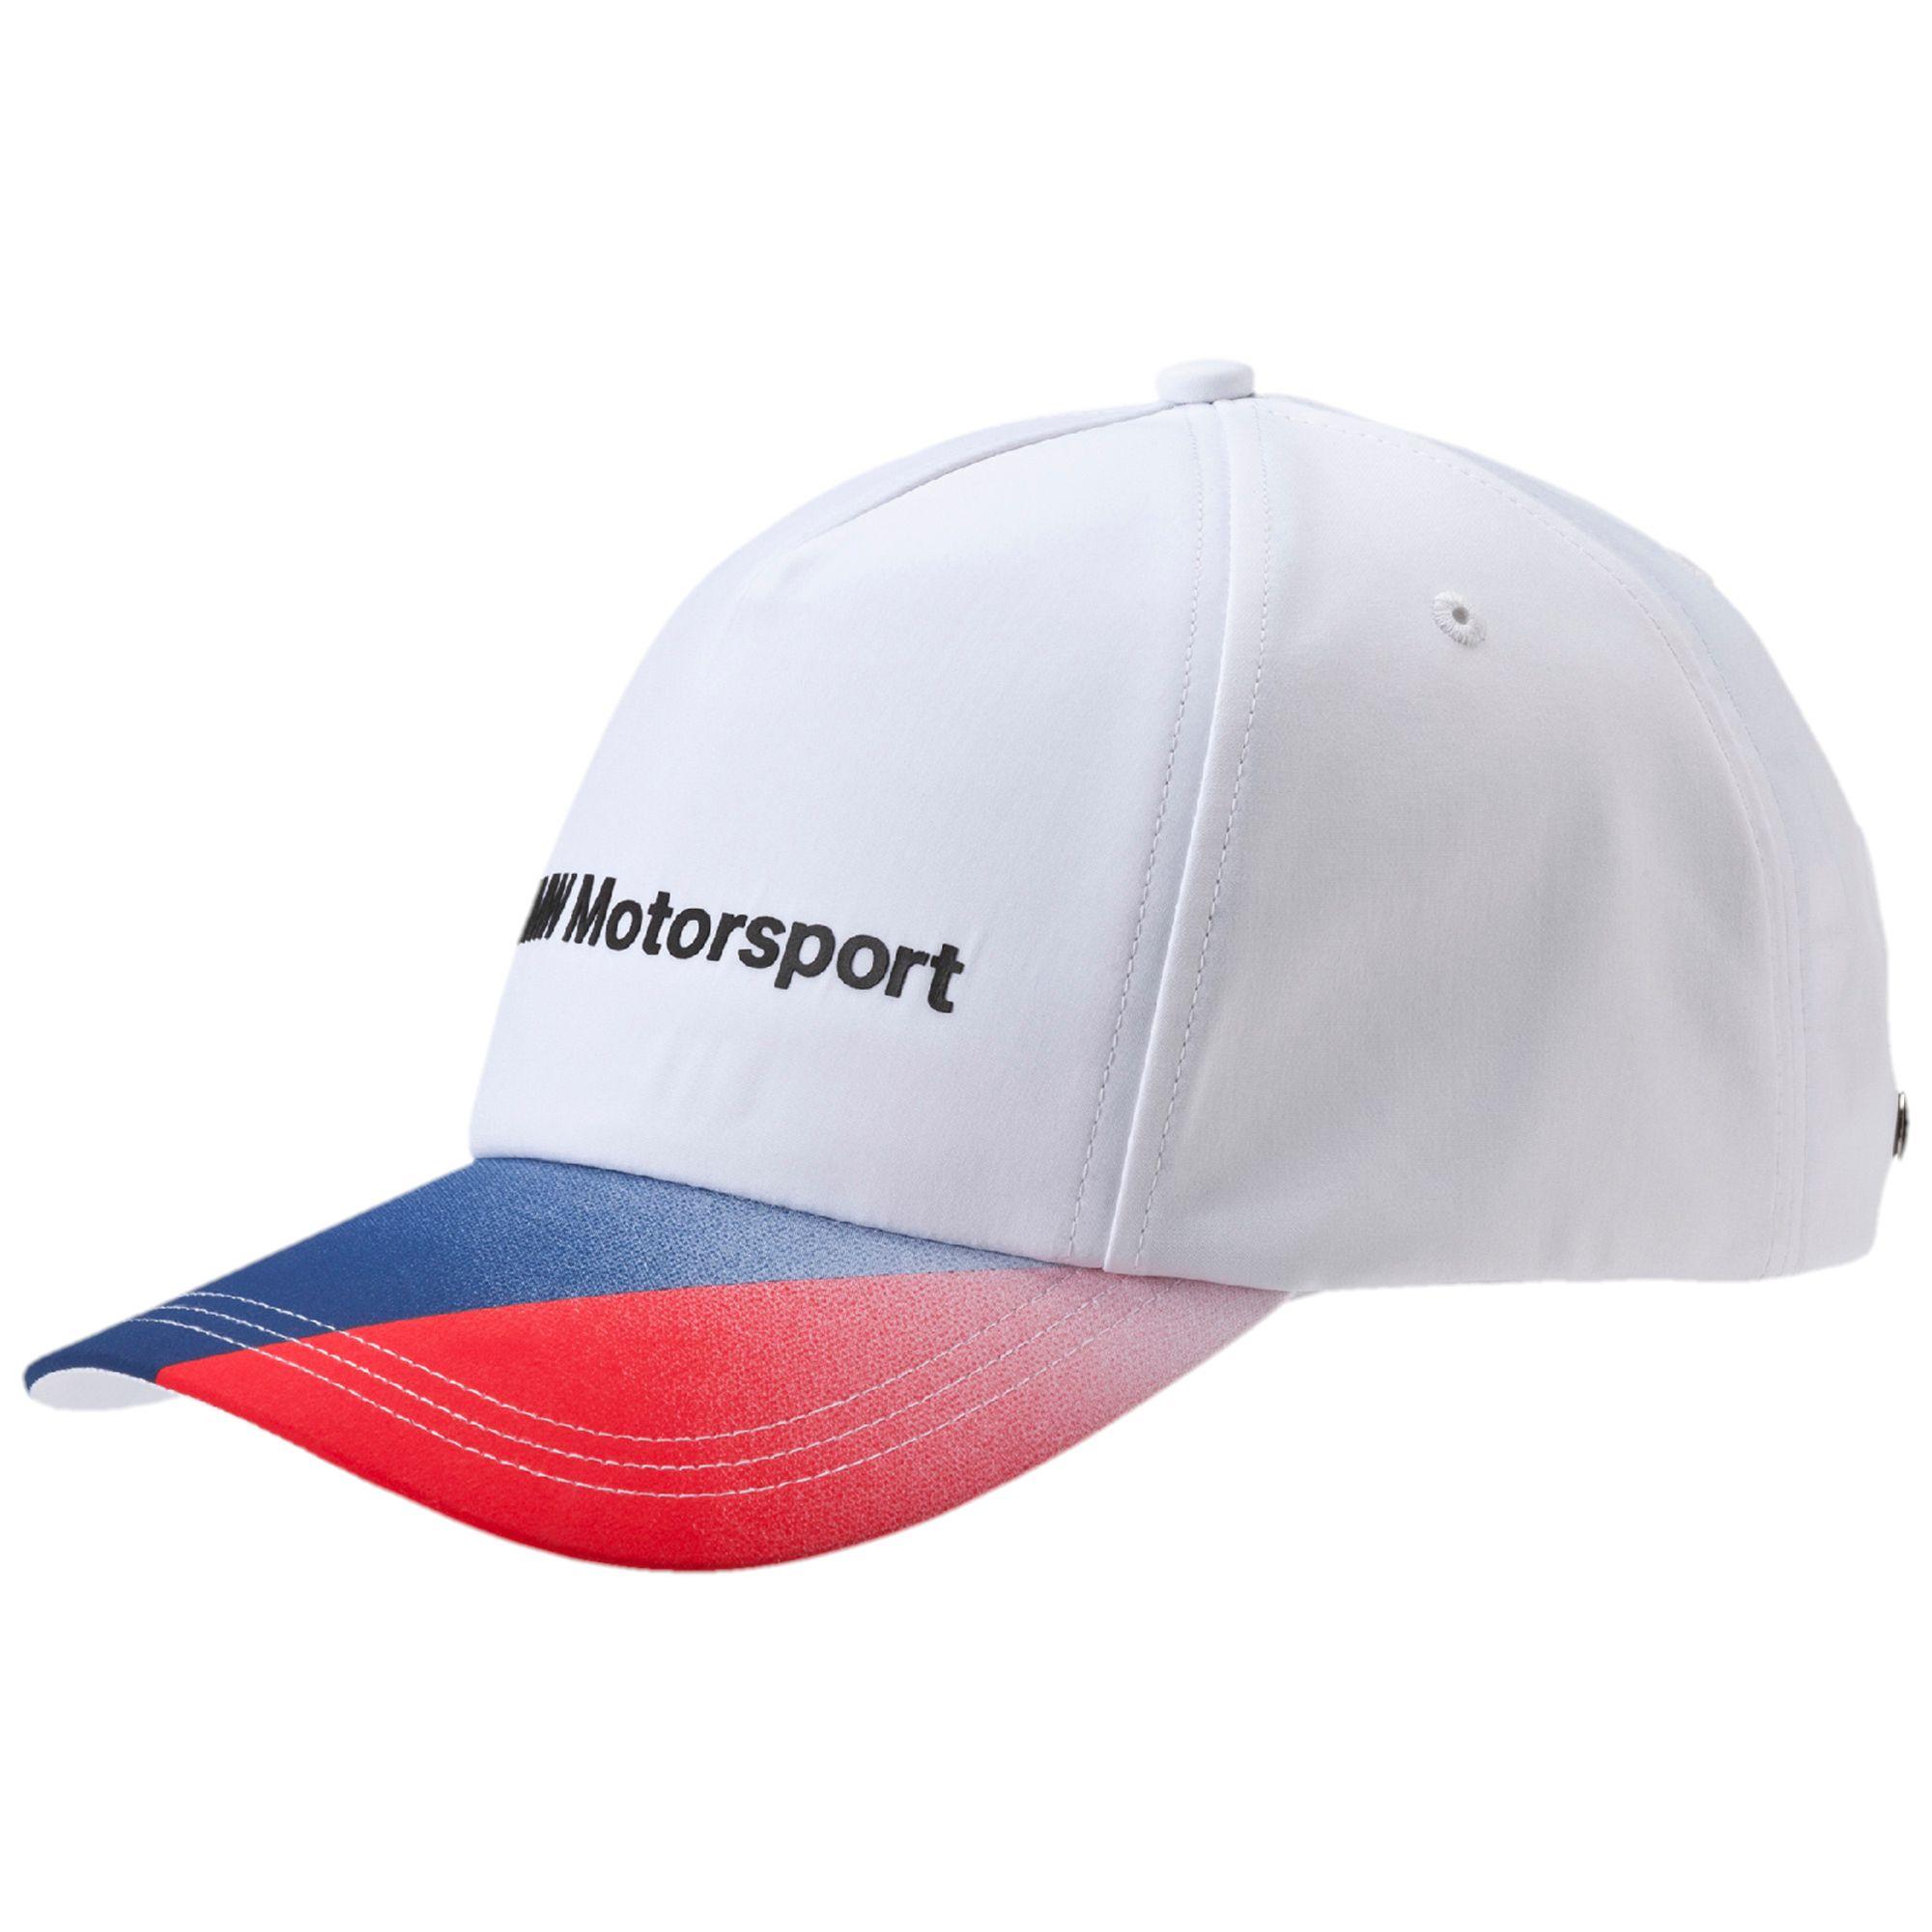 bmw hats snapbacks power mens m unisex trucker cap caps baseball product